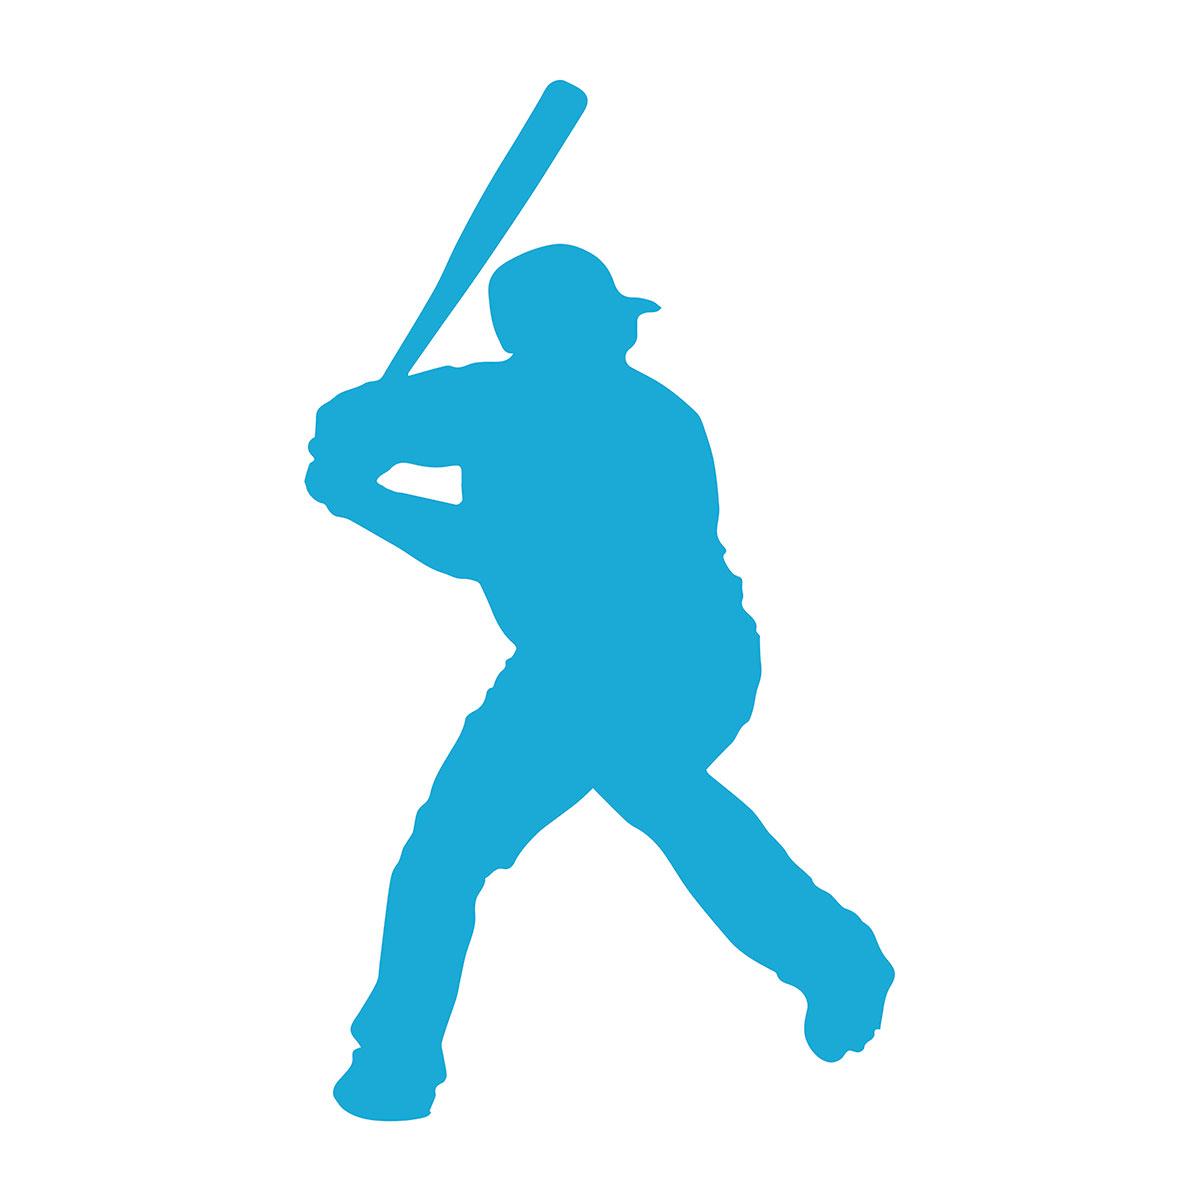 Silhouette of baseball player preparing to swing bat